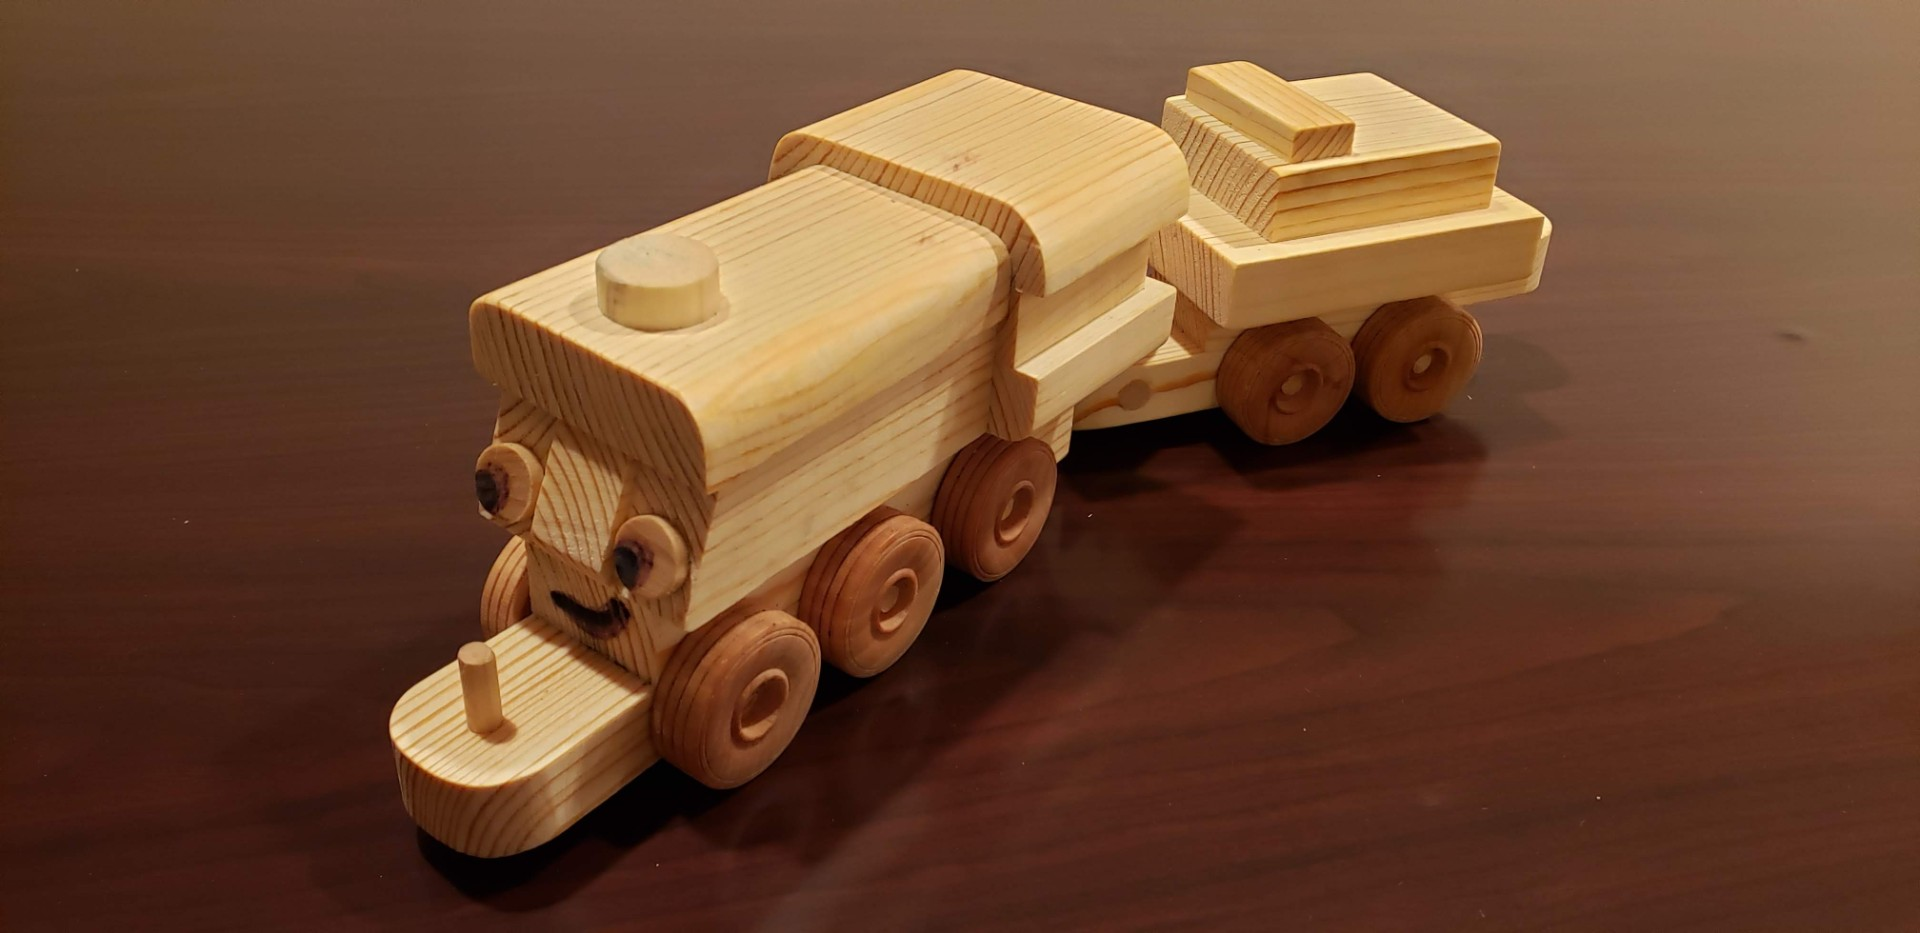 pufferbilly toy train 002.jpg